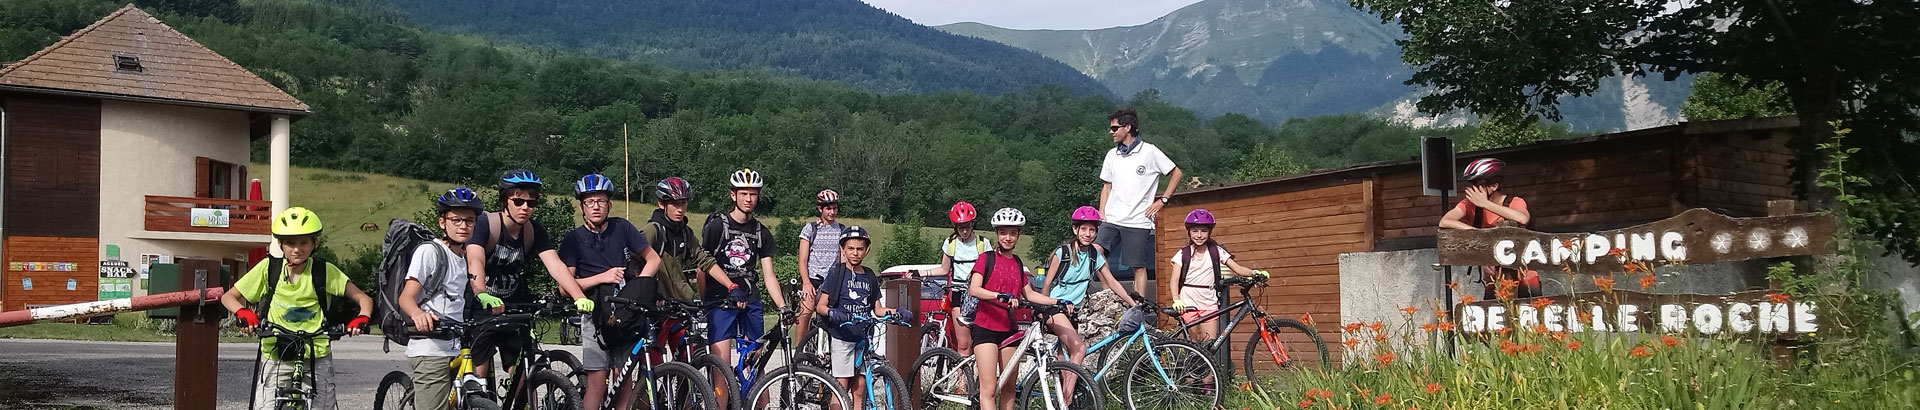 Camping Belleroche Accueil de groupes (cyclistes, randonneurs, cavaliers, motards)